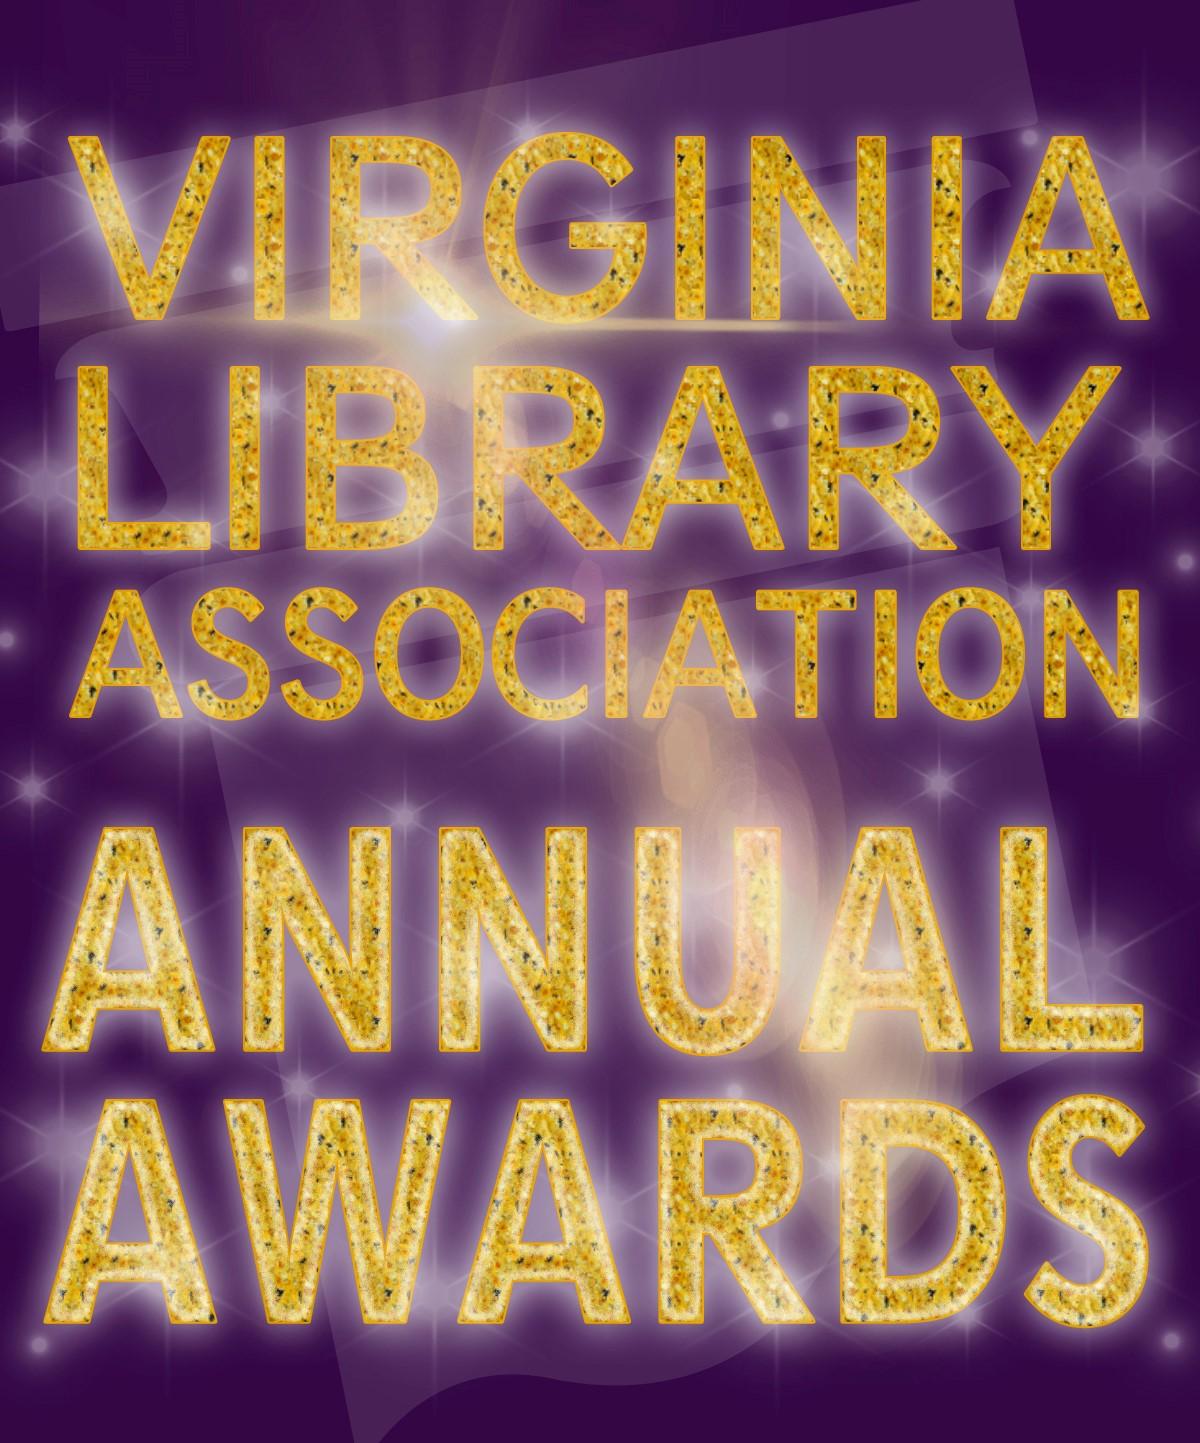 Virginia Library Association Annual Awards